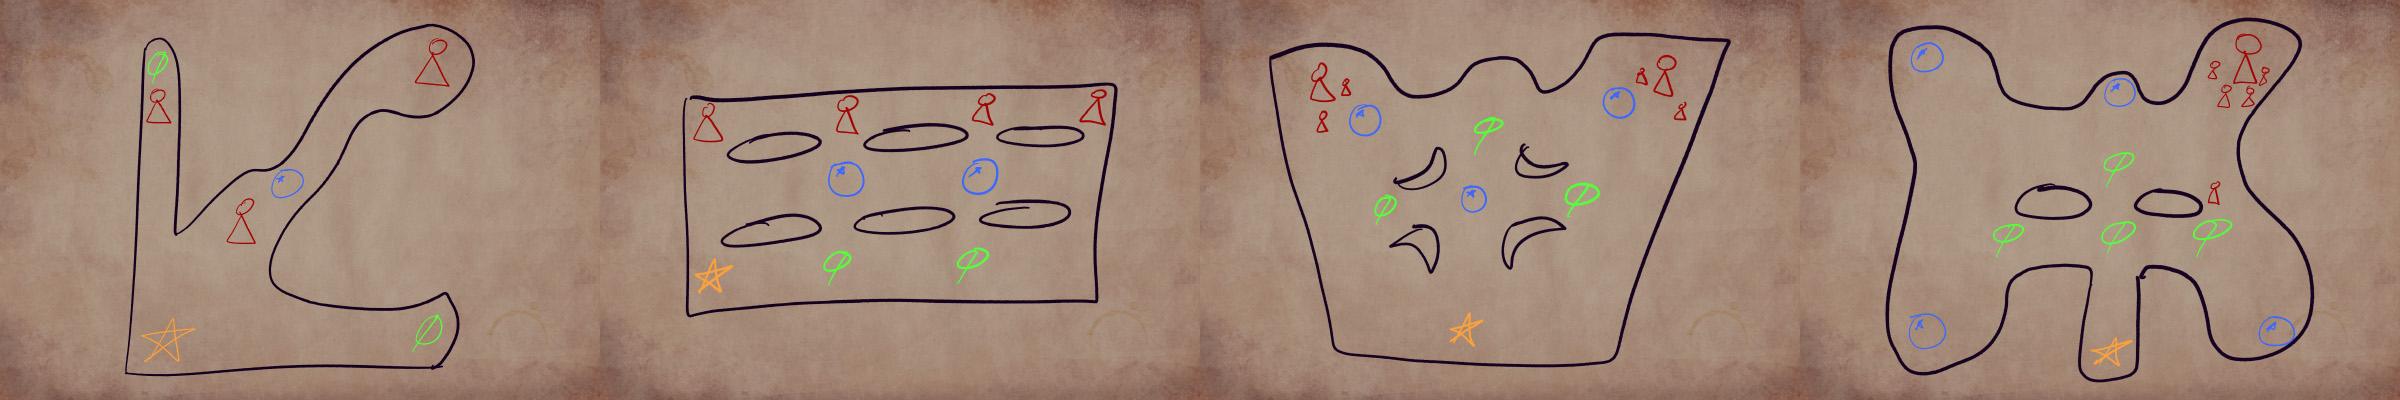 Level Design Evolution